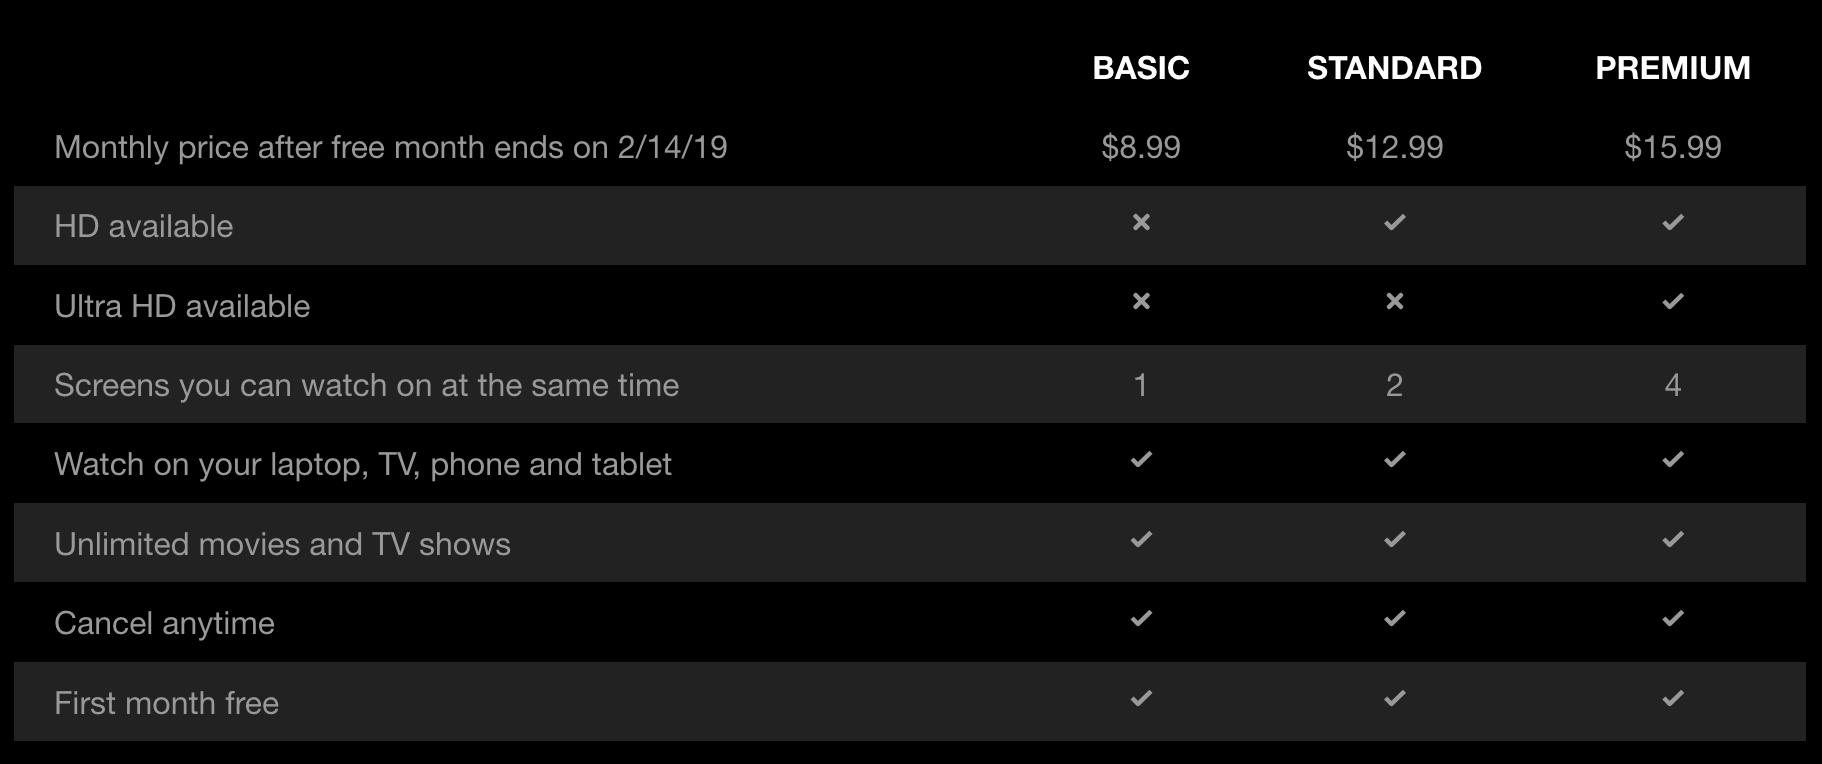 Netflix plan pricing grid